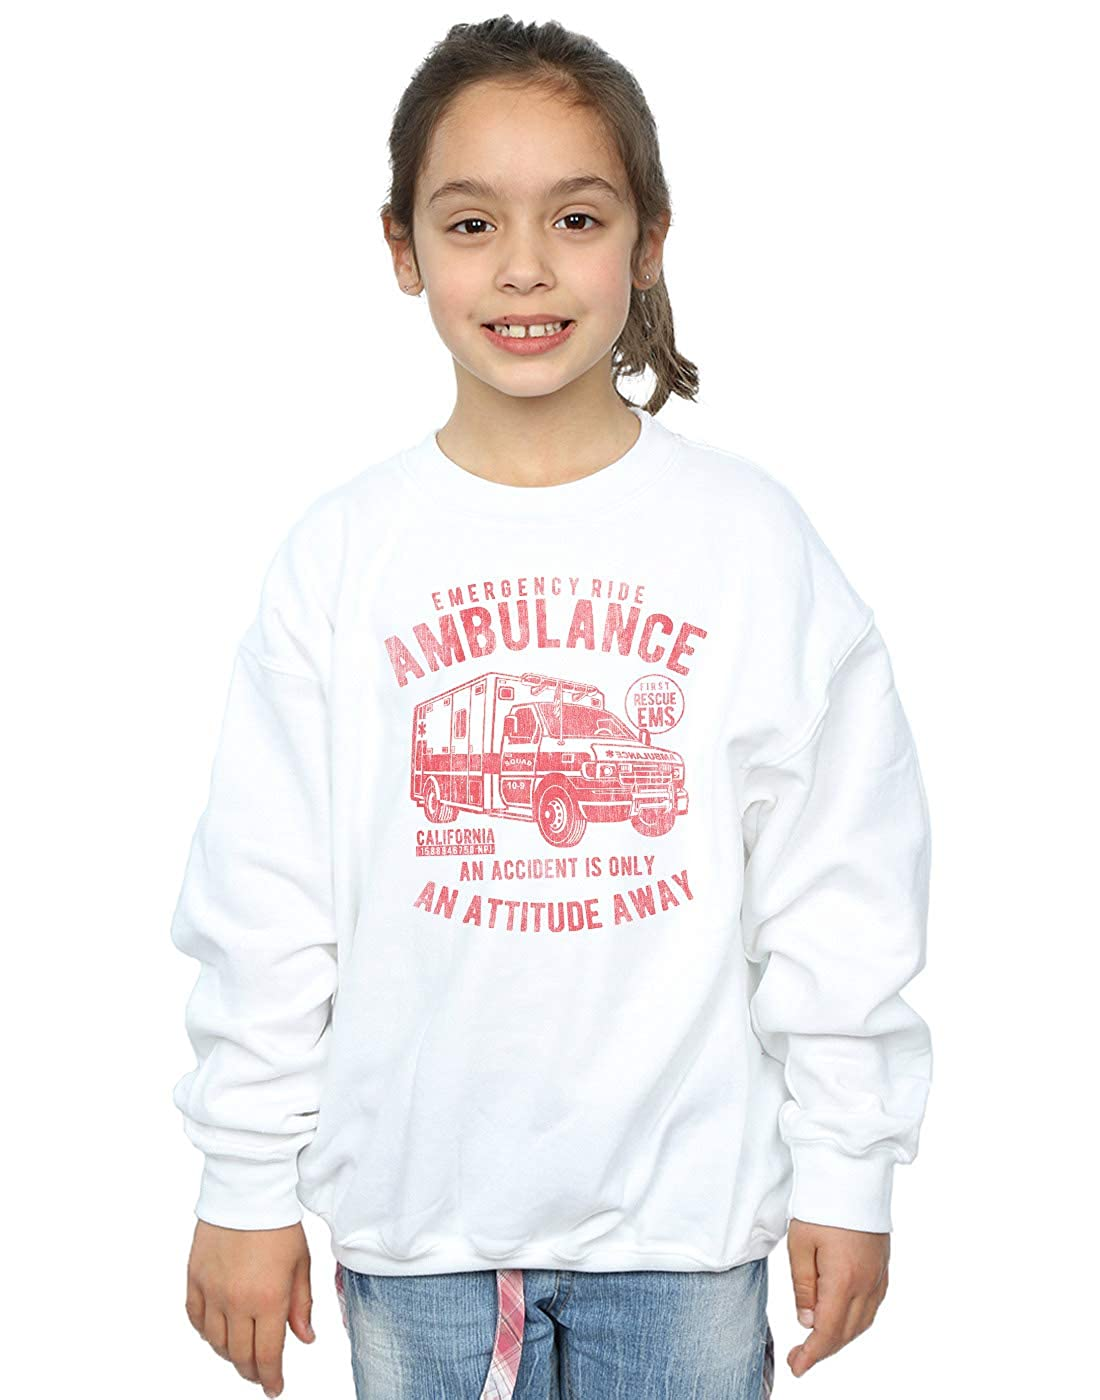 Drewbacca Girls Emergency Ride Sweatshirt